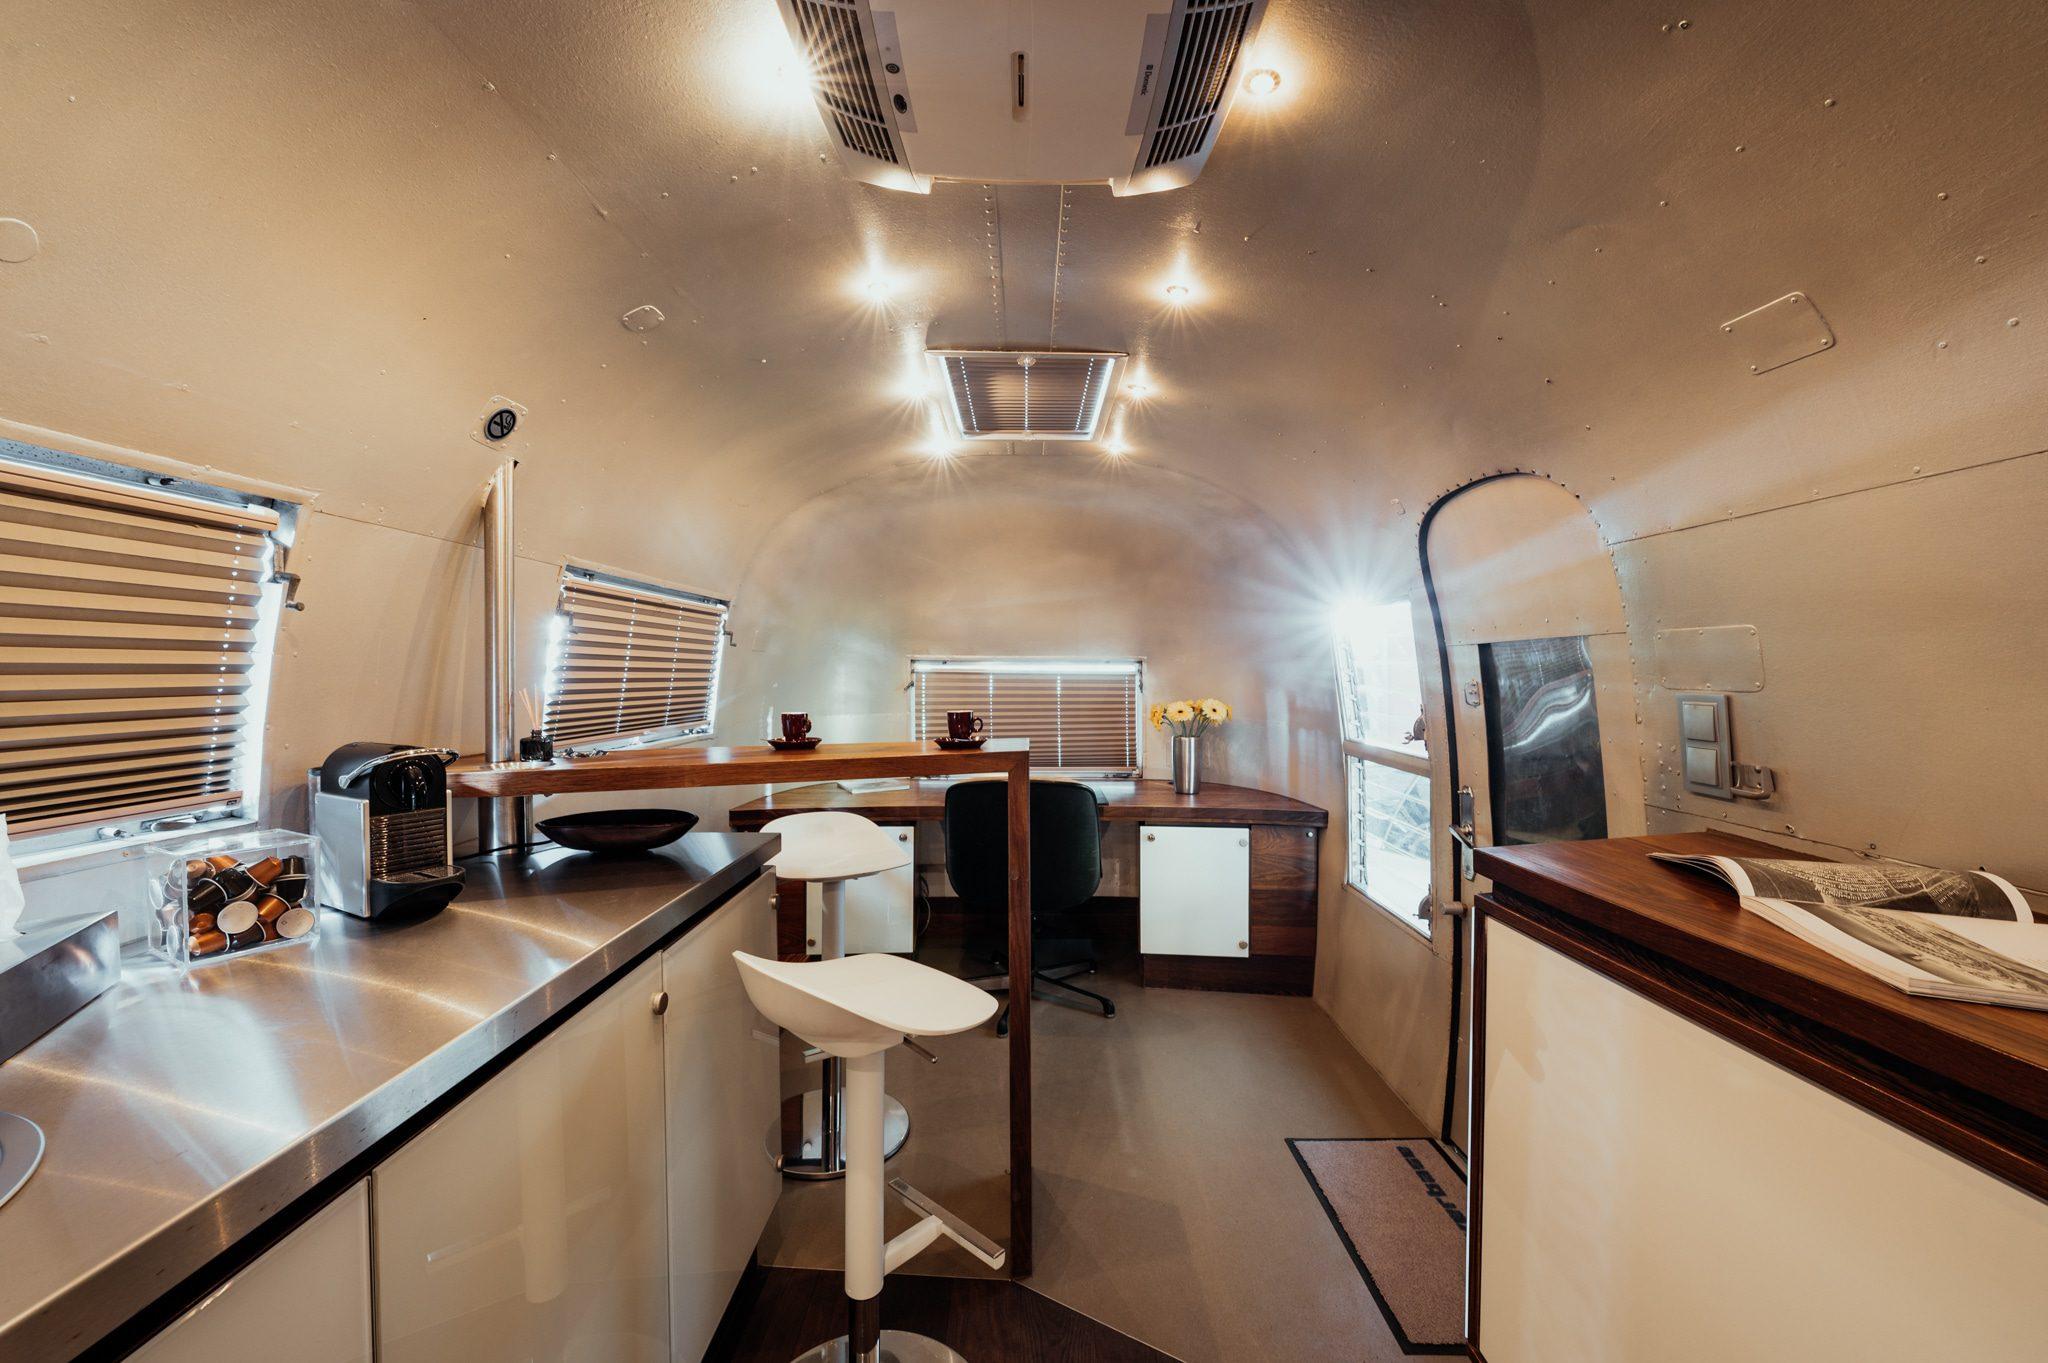 Airstream I innen - Silverbase